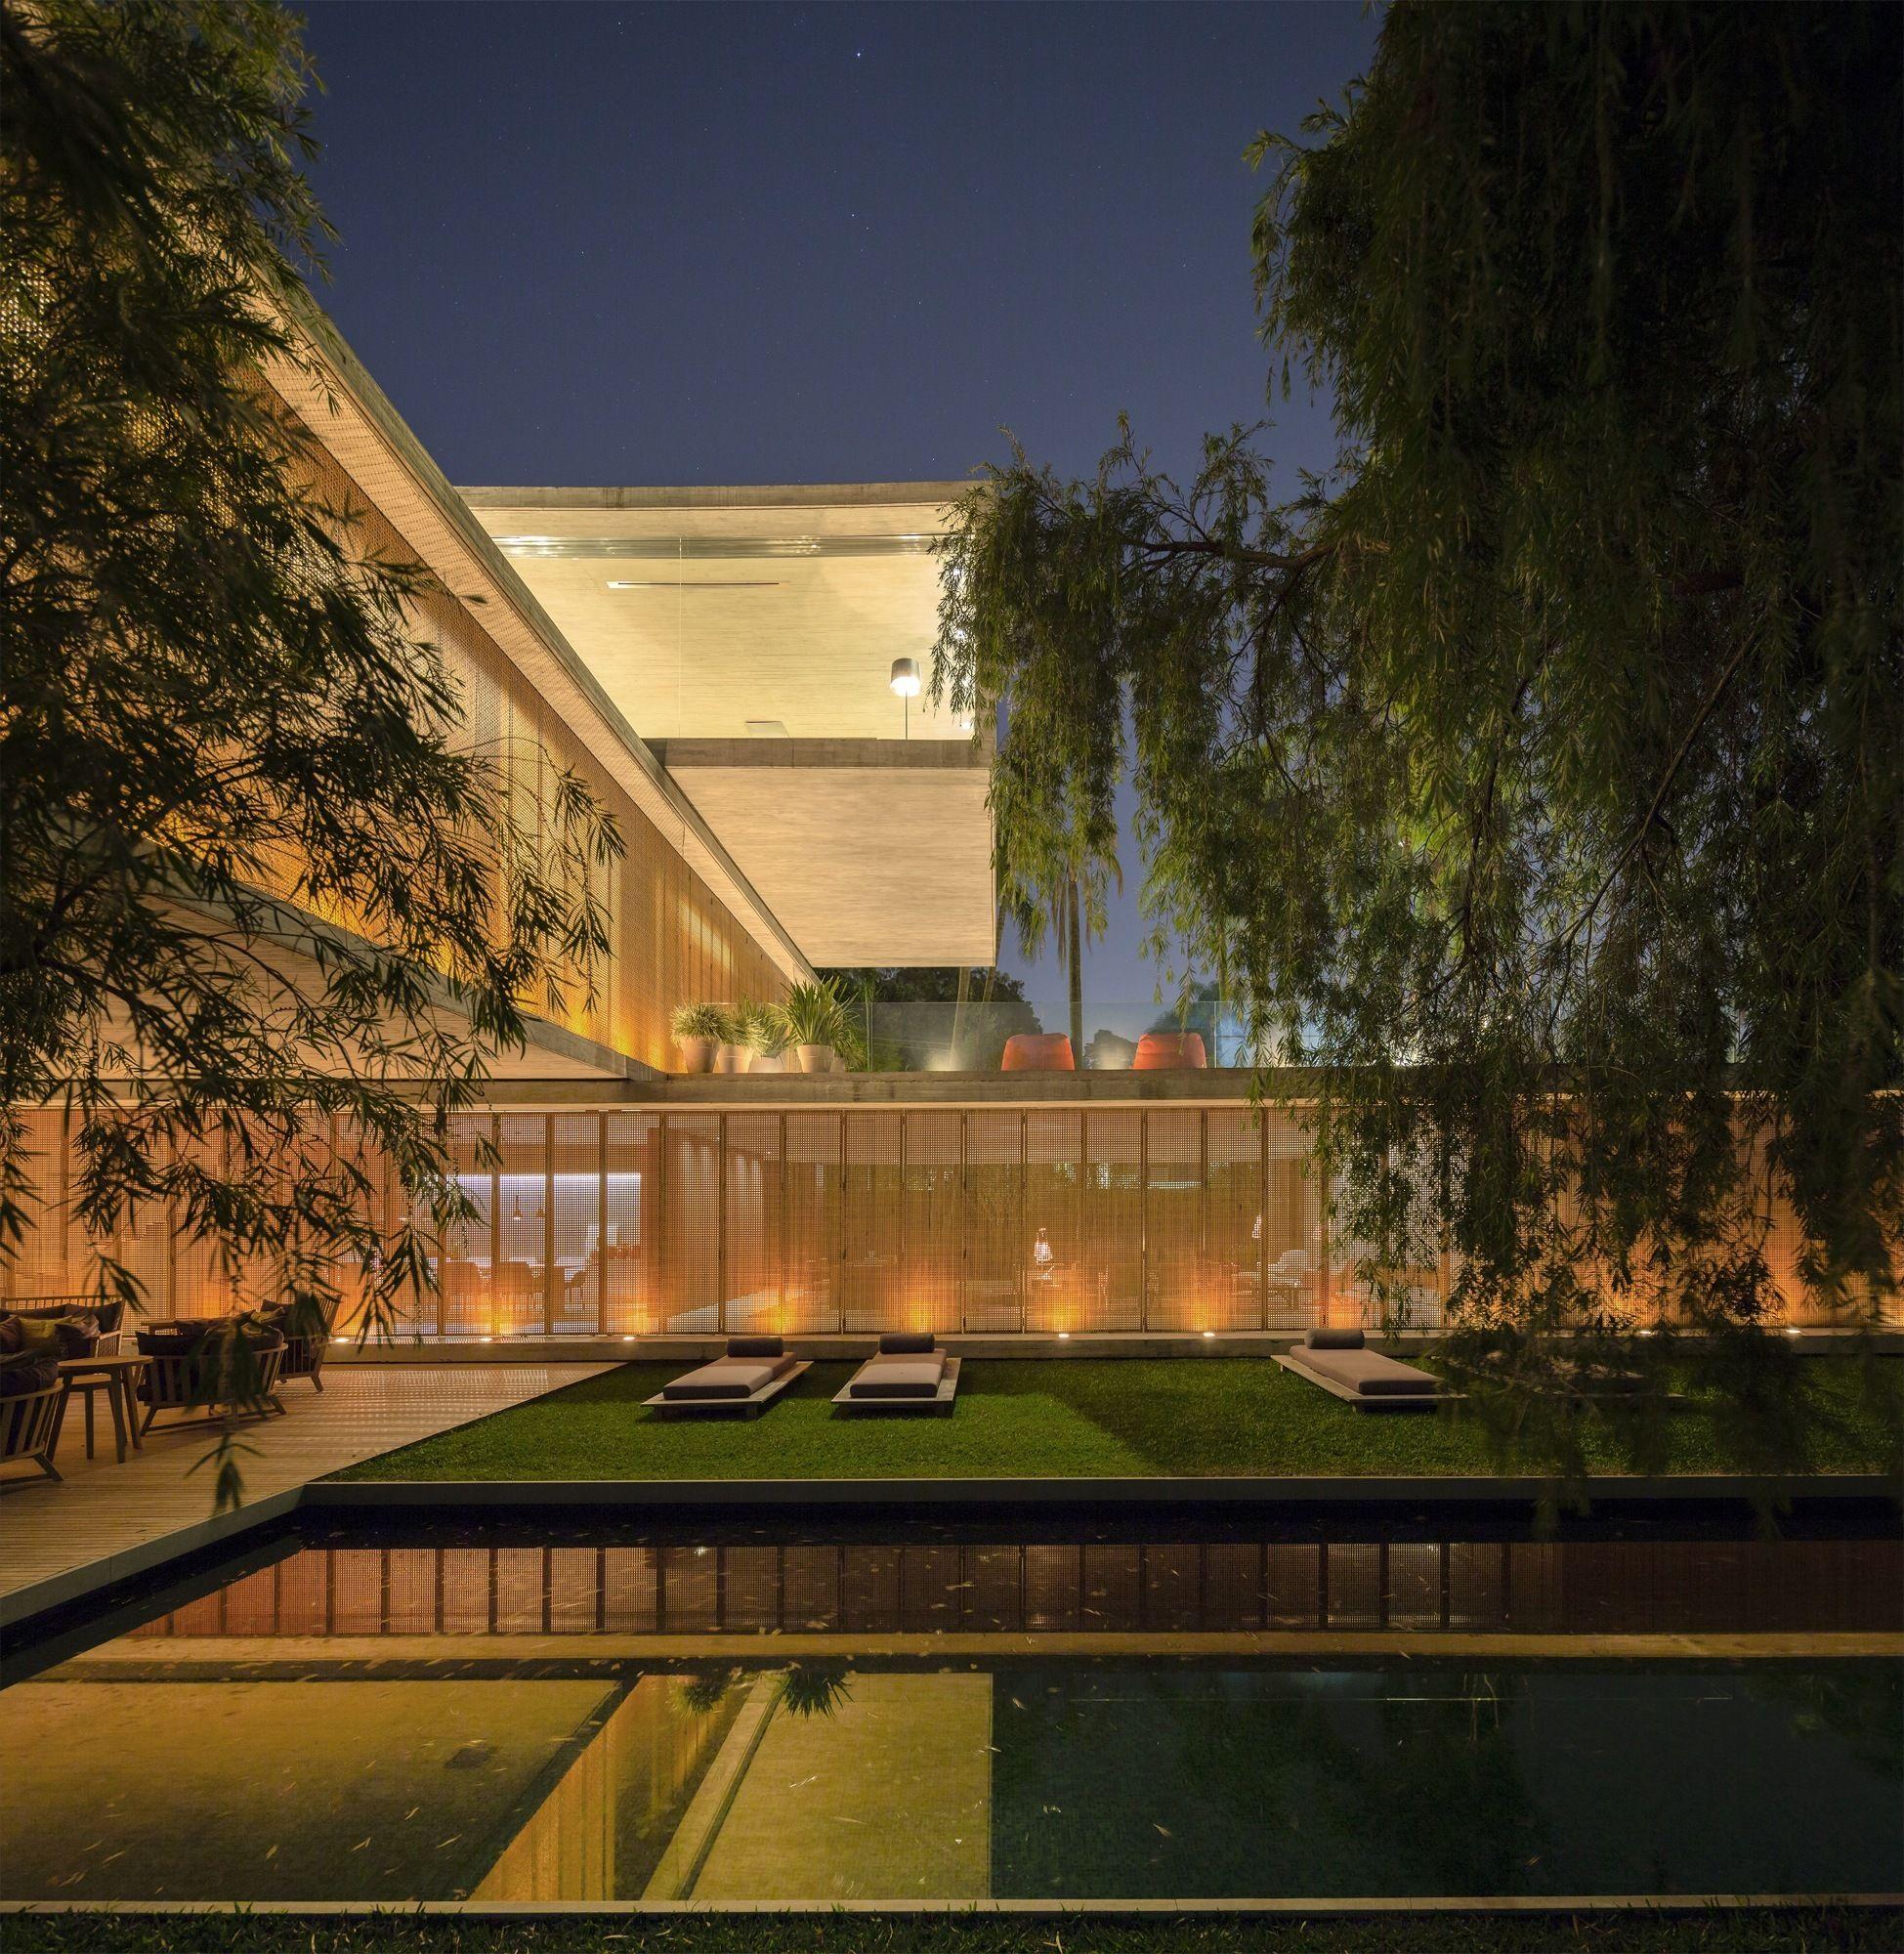 Open layout house concept by studio mk27 - Galeria Casa P Studio Mk27 Marcio Kogan Lair Reis 81